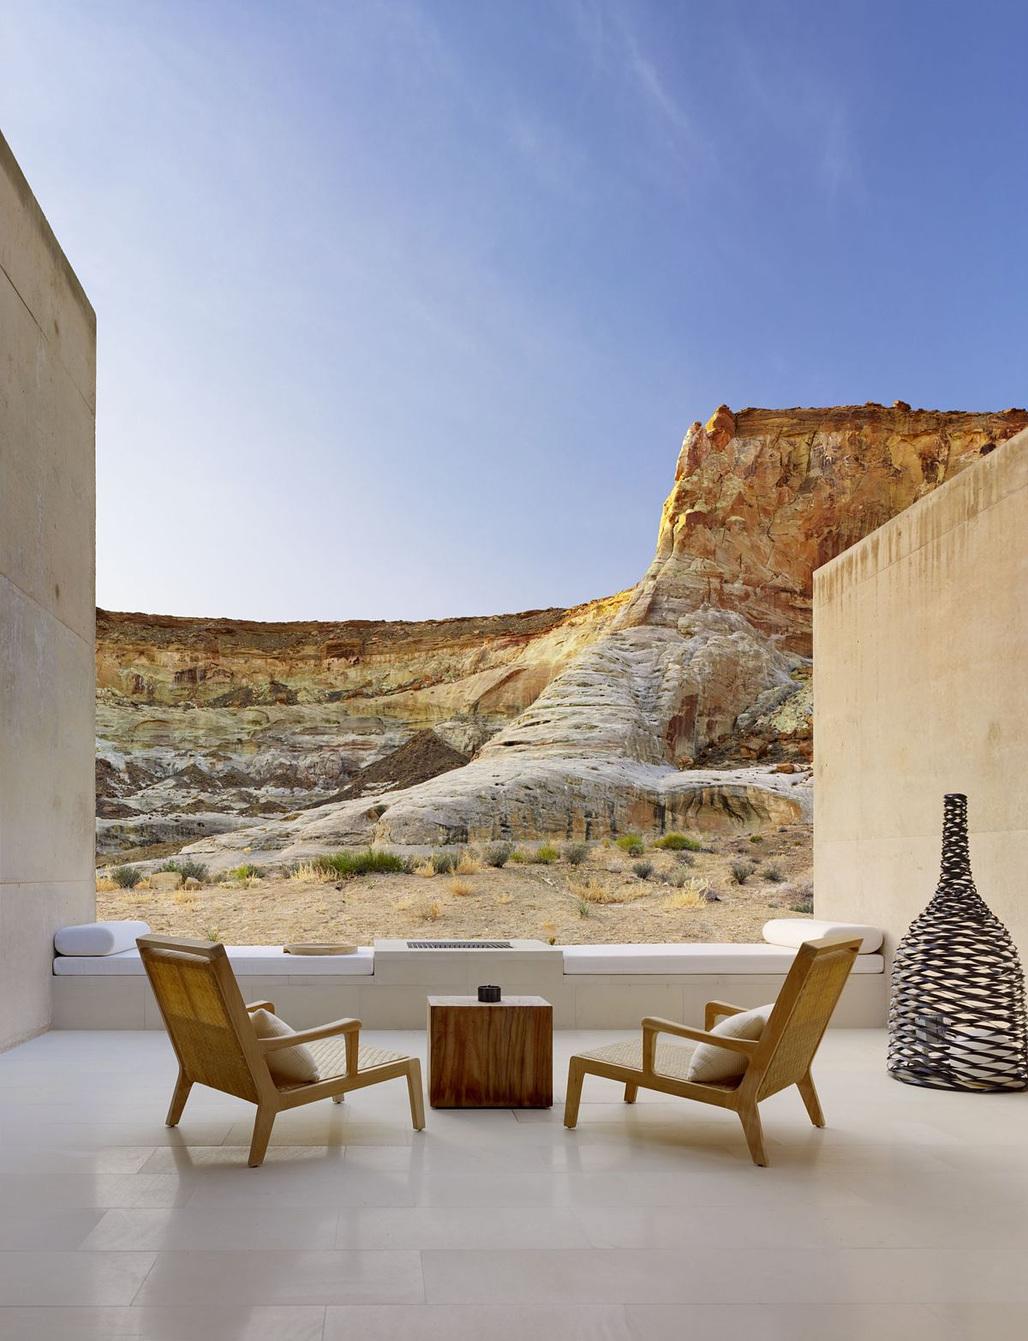 Amangiri Resort + Spa in Canyon Point, UT by Marwan Al-Sayed Inc. Architecture + Design, Wendell Burnette and Rick Joy; Photo: Joe Fletcher